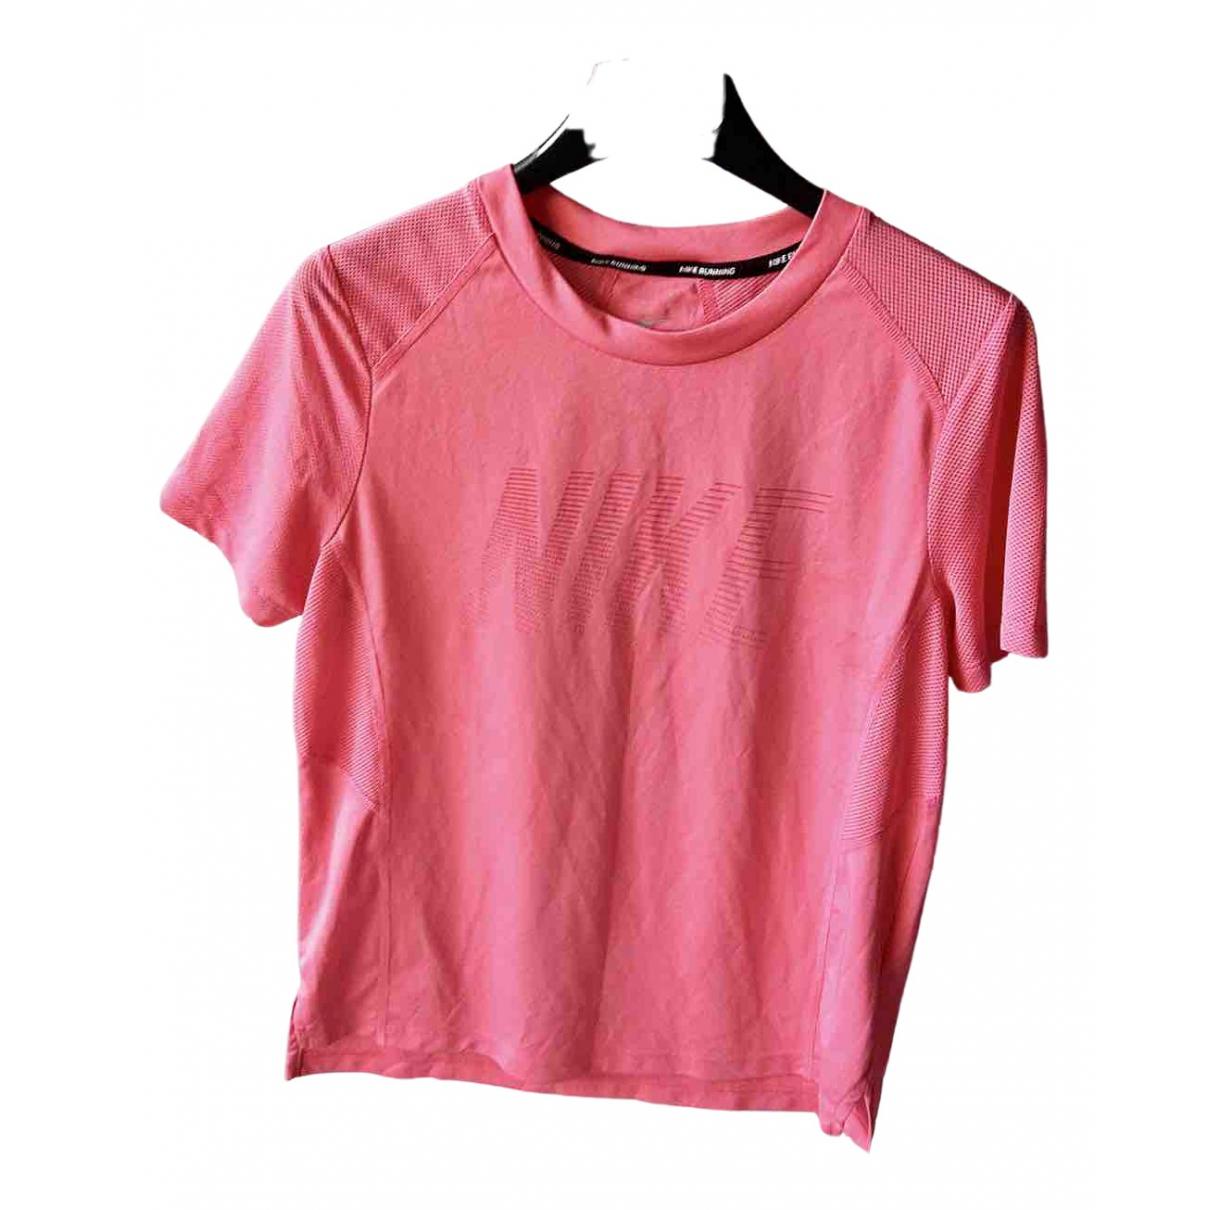 Nike \N Pink  top for Women S International